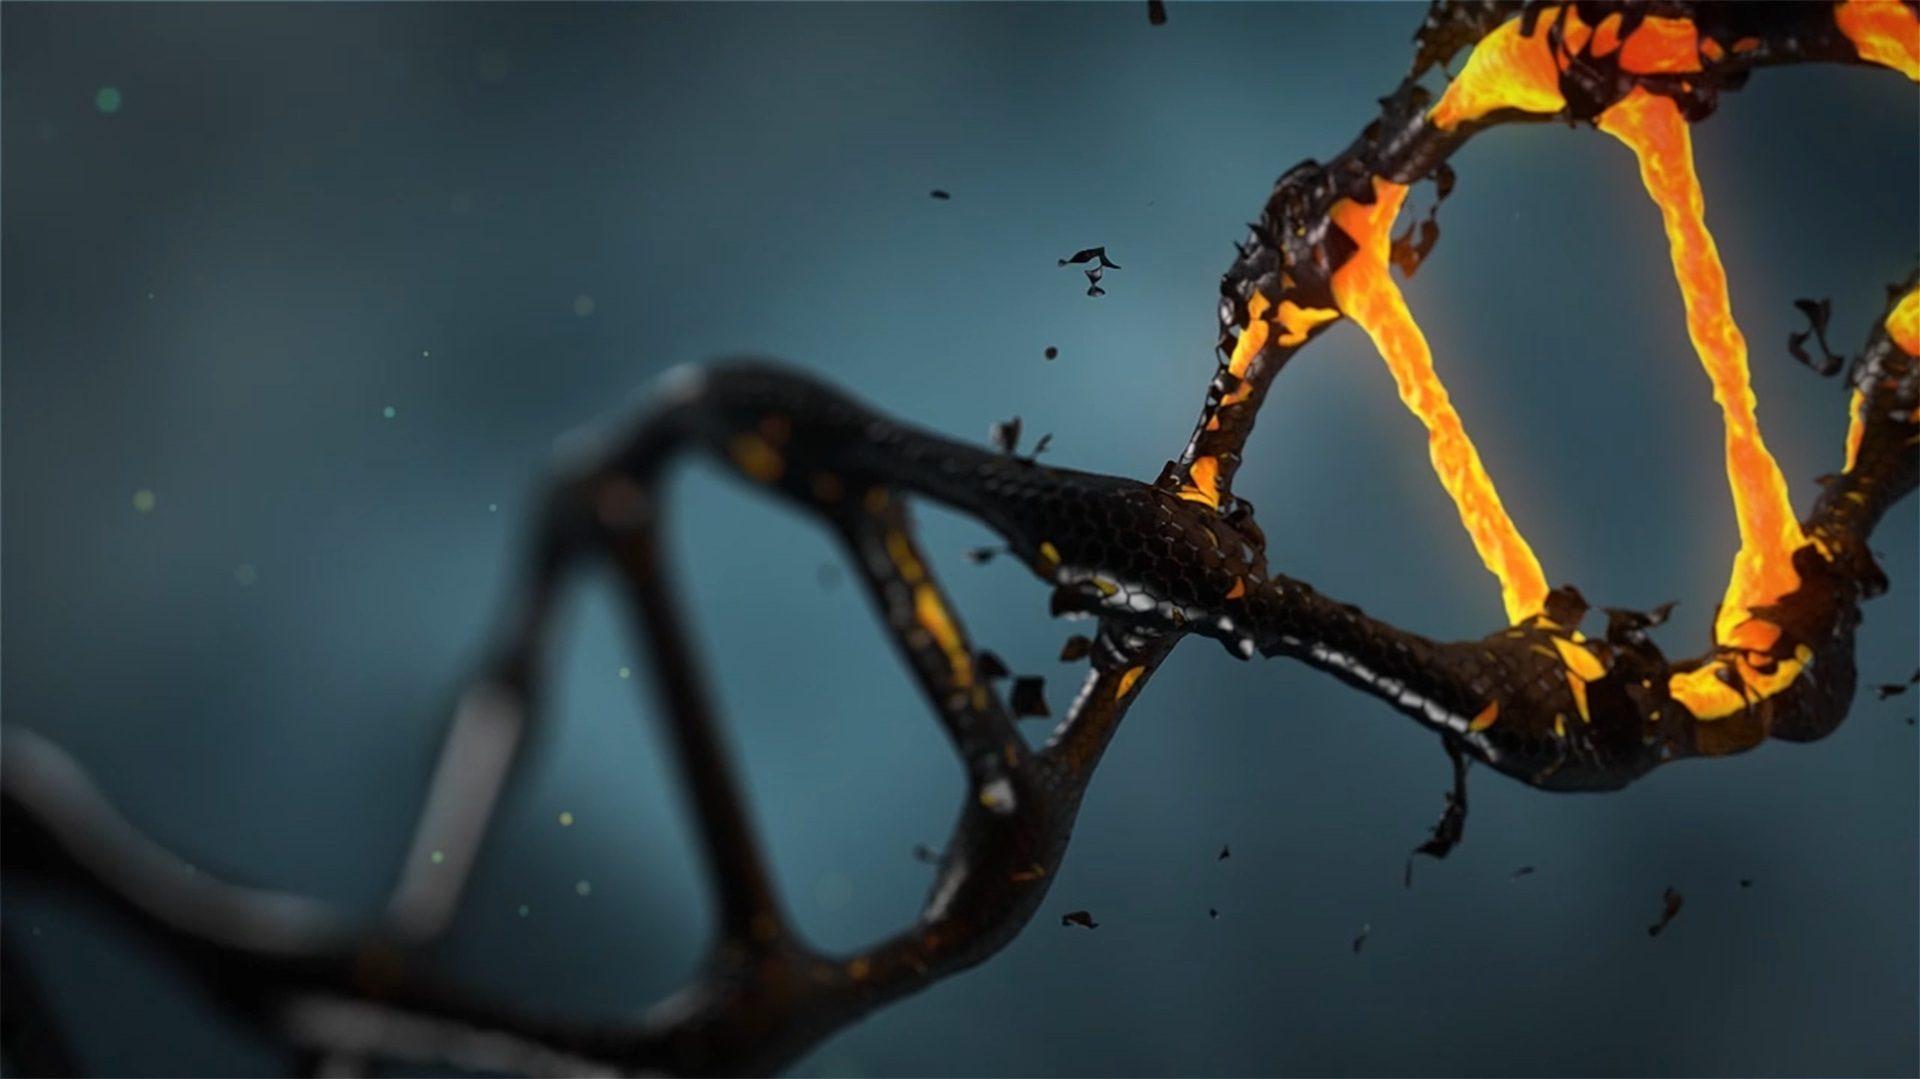 DNA, molecola, geni, vita, proteine - Sfondi HD - Professor-falken.com